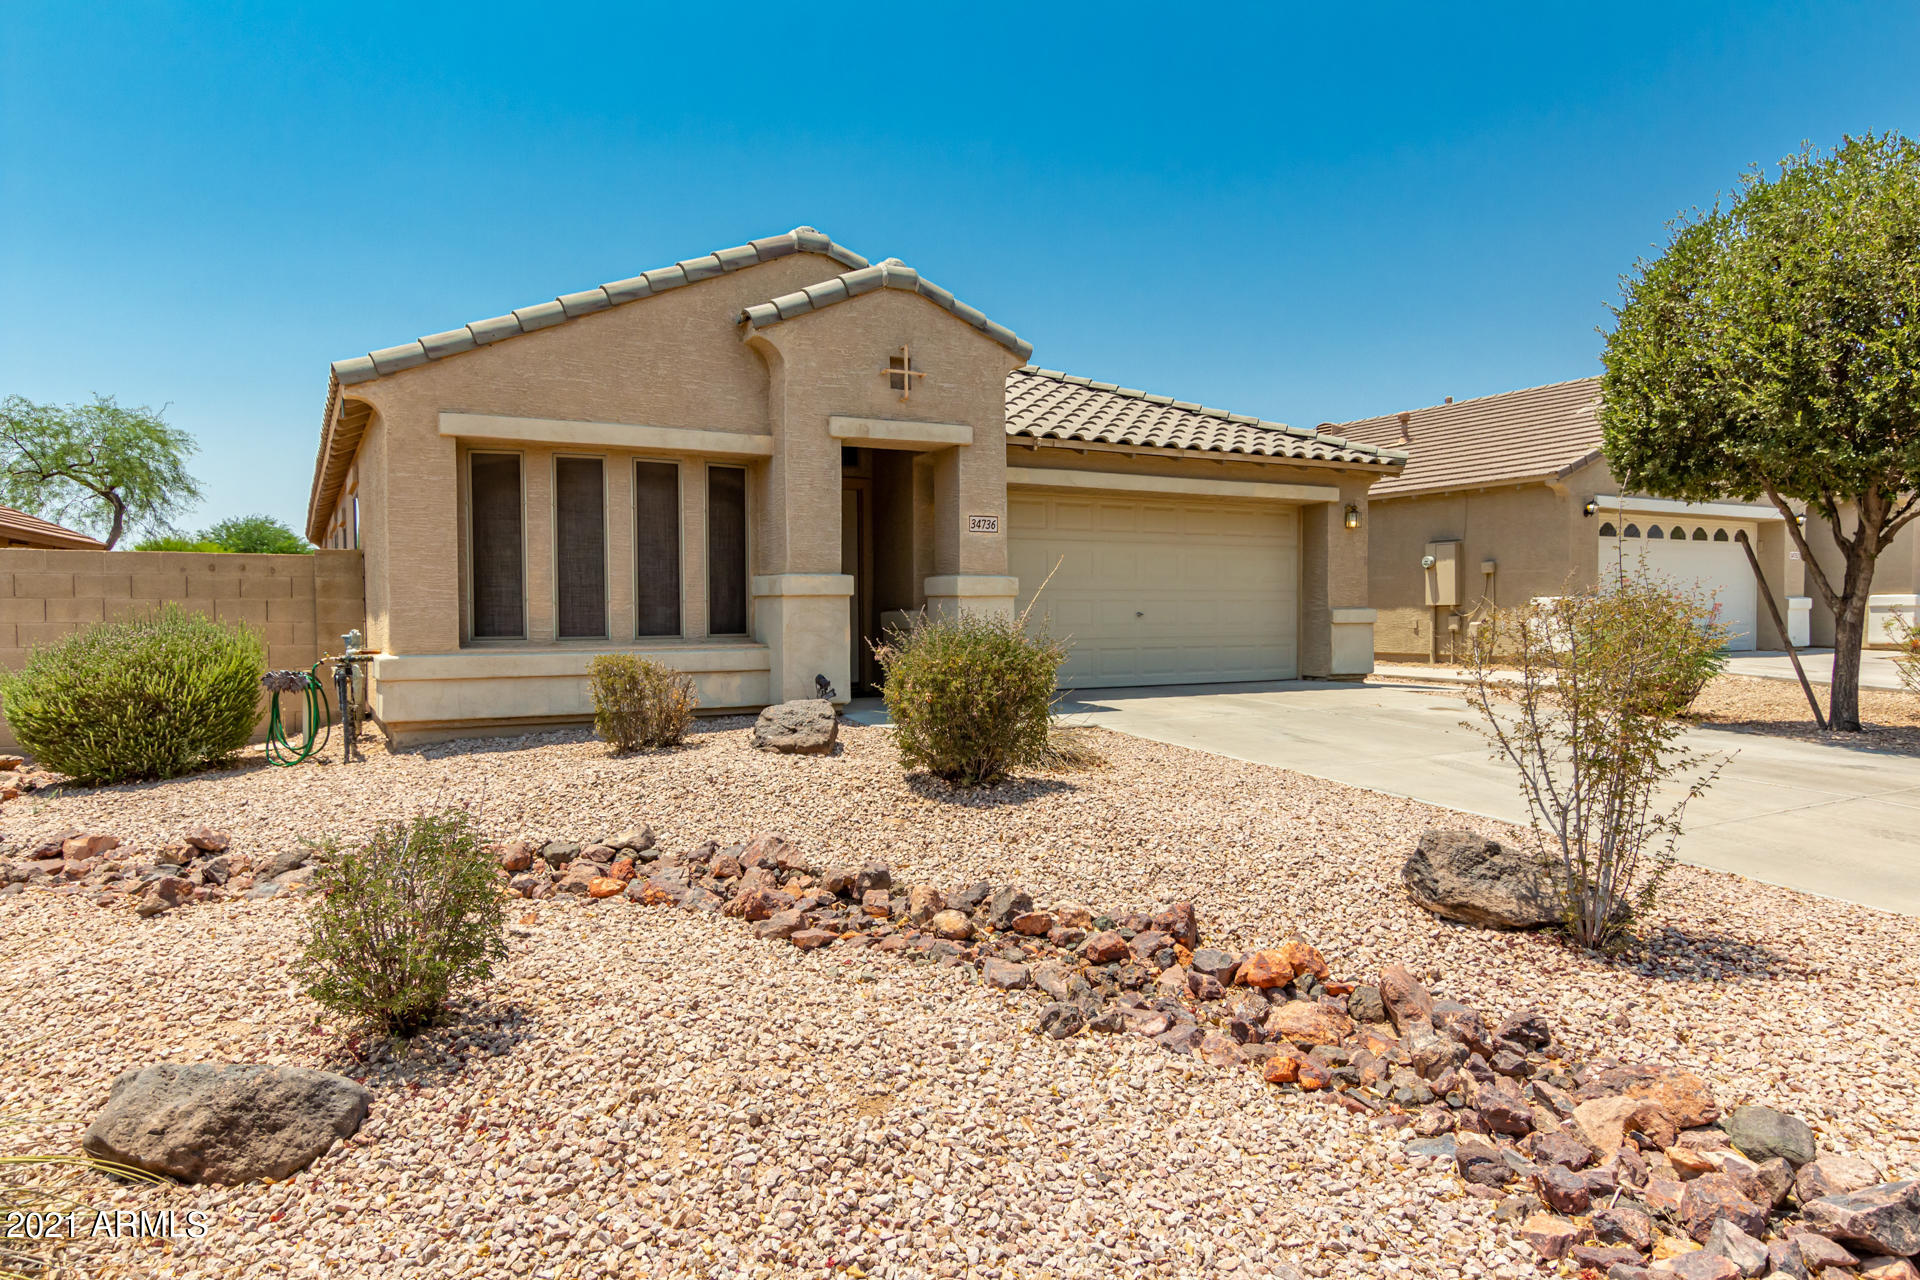 34736 BARKA Trail, San Tan Valley, Arizona 85143, 3 Bedrooms Bedrooms, ,2 BathroomsBathrooms,Residential,For Sale,BARKA,6255056